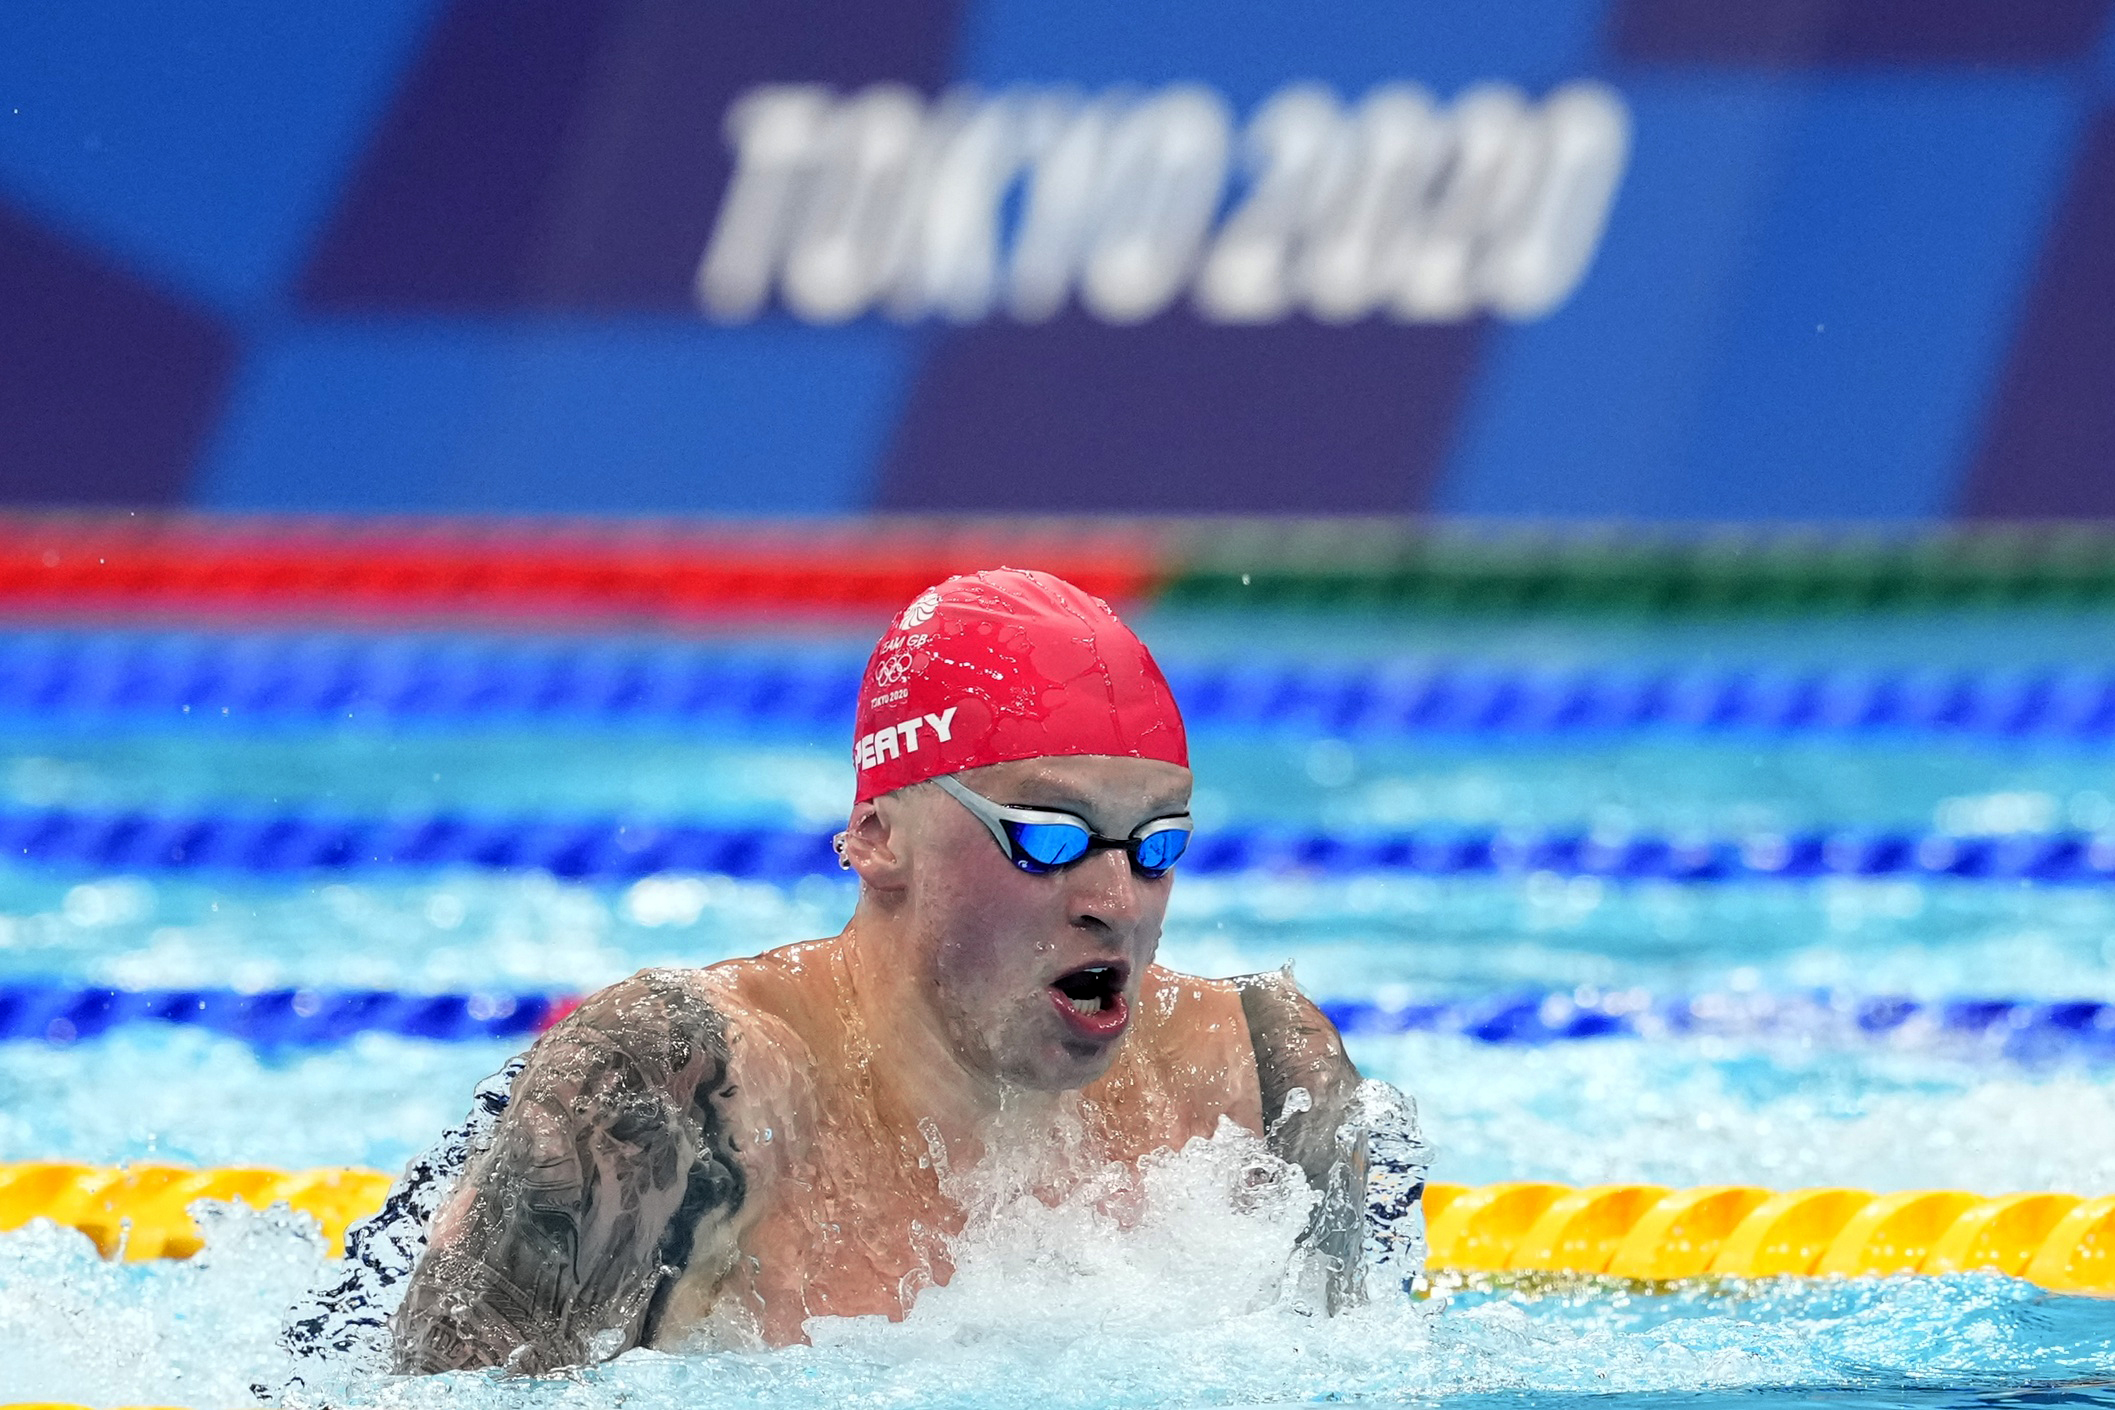 Tokyo 2020 Olympics - Swimming - Men's 100m Breaststroke - Final - Tokyo Aquatics Centre - Tokyo, Japan - July 26, 2021.  Adam Peaty of Britain in action. REUTERS/Aleksandra Szmigiel